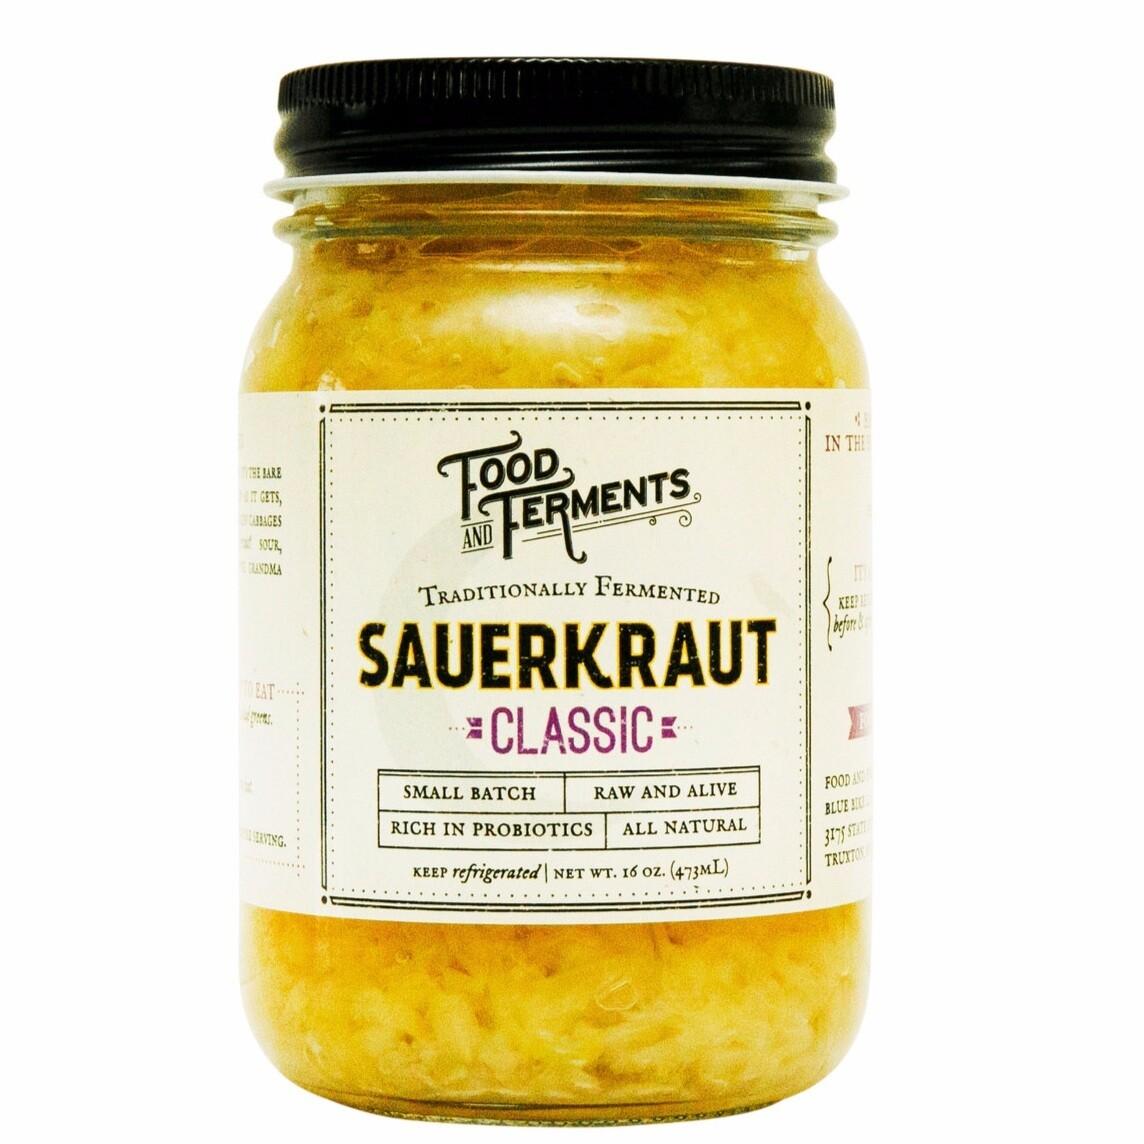 Sauerkraut - Food and Ferments - Truxton, NY